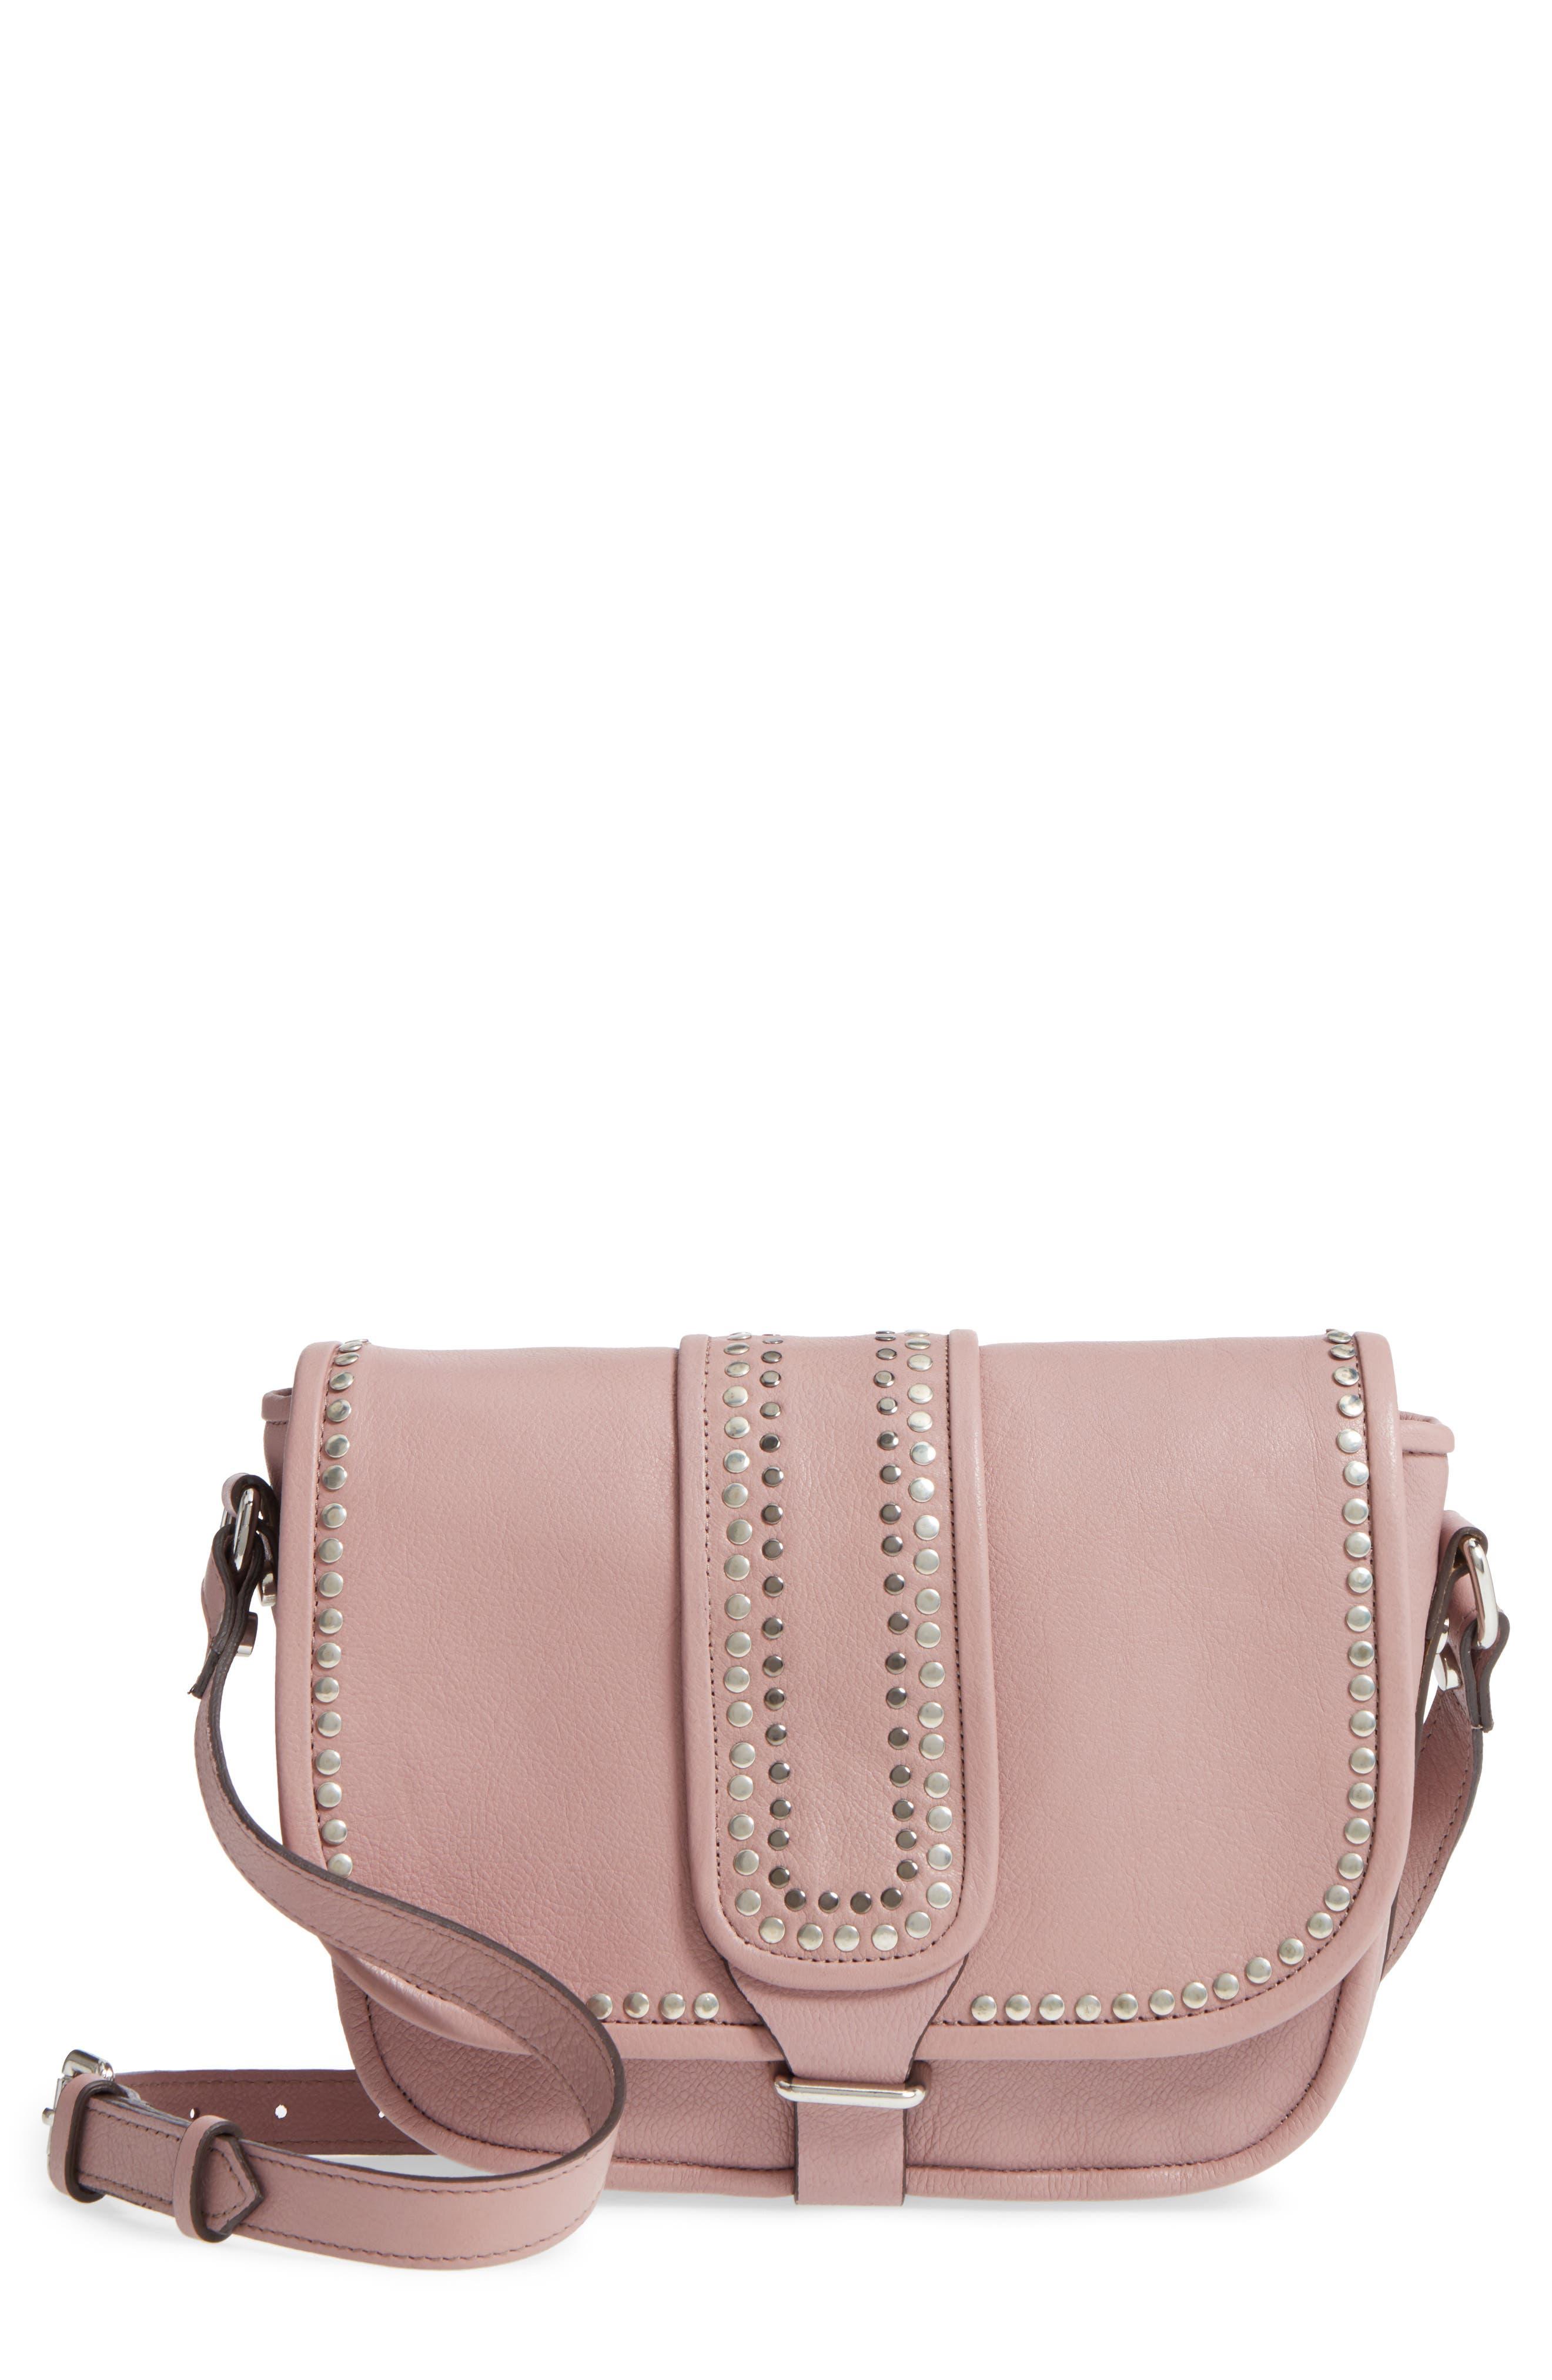 Premium Leather Studded Shoulder Bag,                             Main thumbnail 1, color,                             Blush